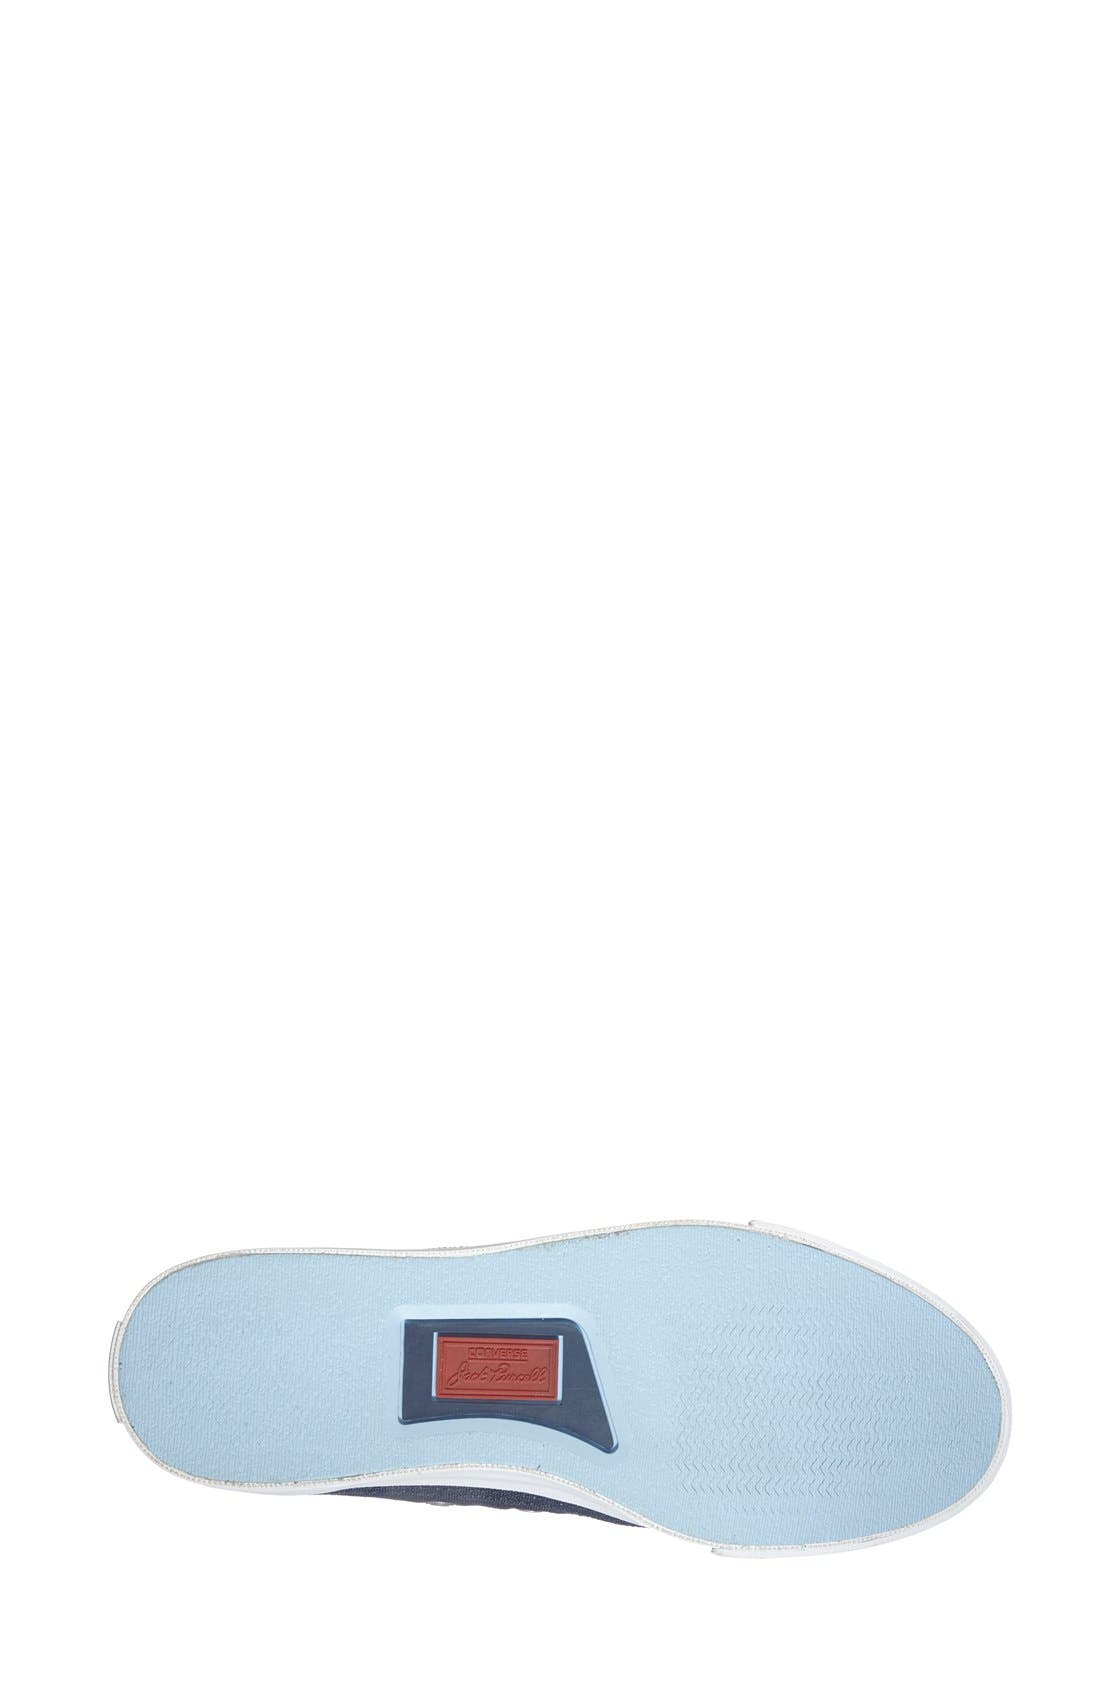 'Jack Purcell' Low Top Slip On Sneaker,                             Alternate thumbnail 4, color,                             Navy/ Blue/ White